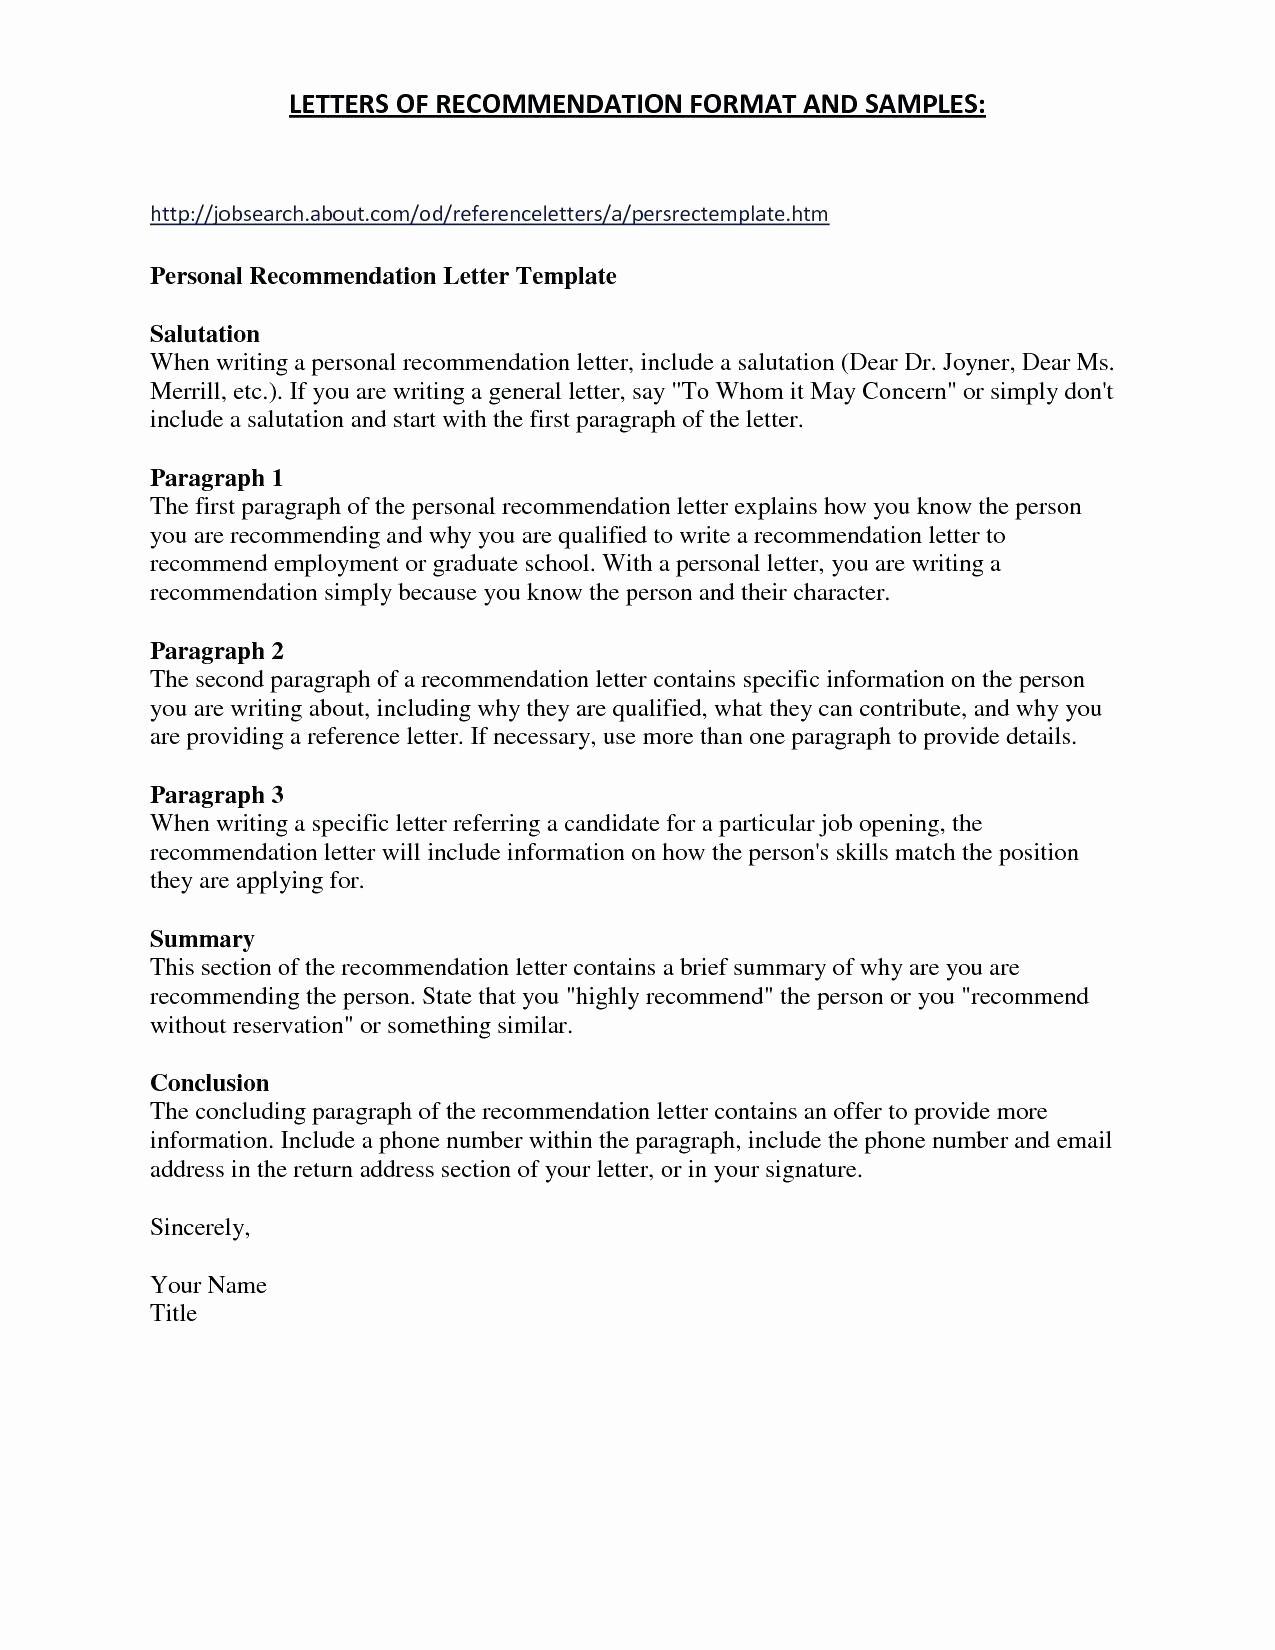 naval-letter-format-template-usmc-18 Usmc Naval Letter Format Template Pdf on naval letter of recommendation, naval memo letter, naval letterhead format, naval memo format, naval standard letter, correspondence letter template, naval correspondence template,